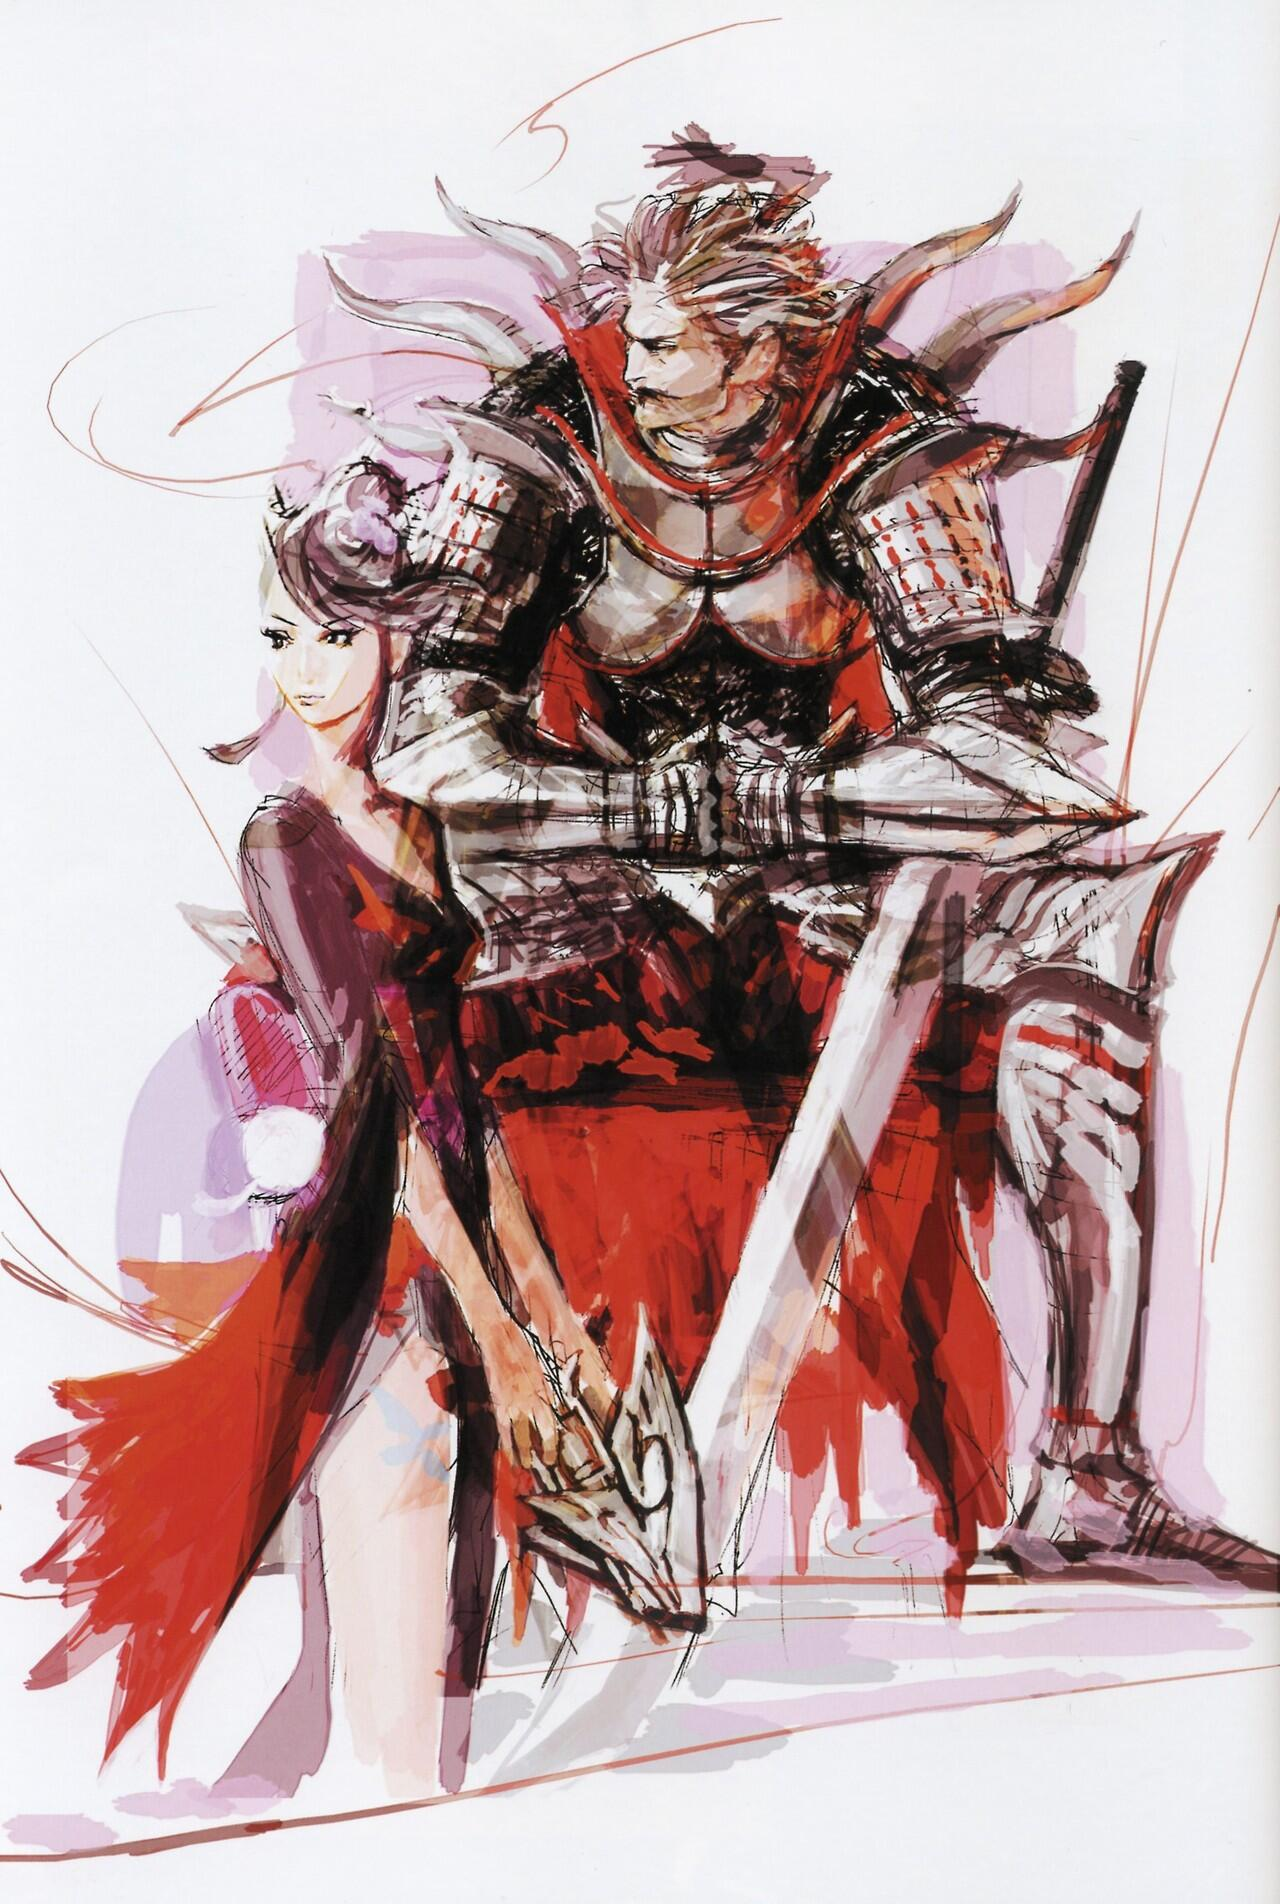 Oda Nobunaga Quotes Sengoku Basara on Twitter Nobunaga Oda